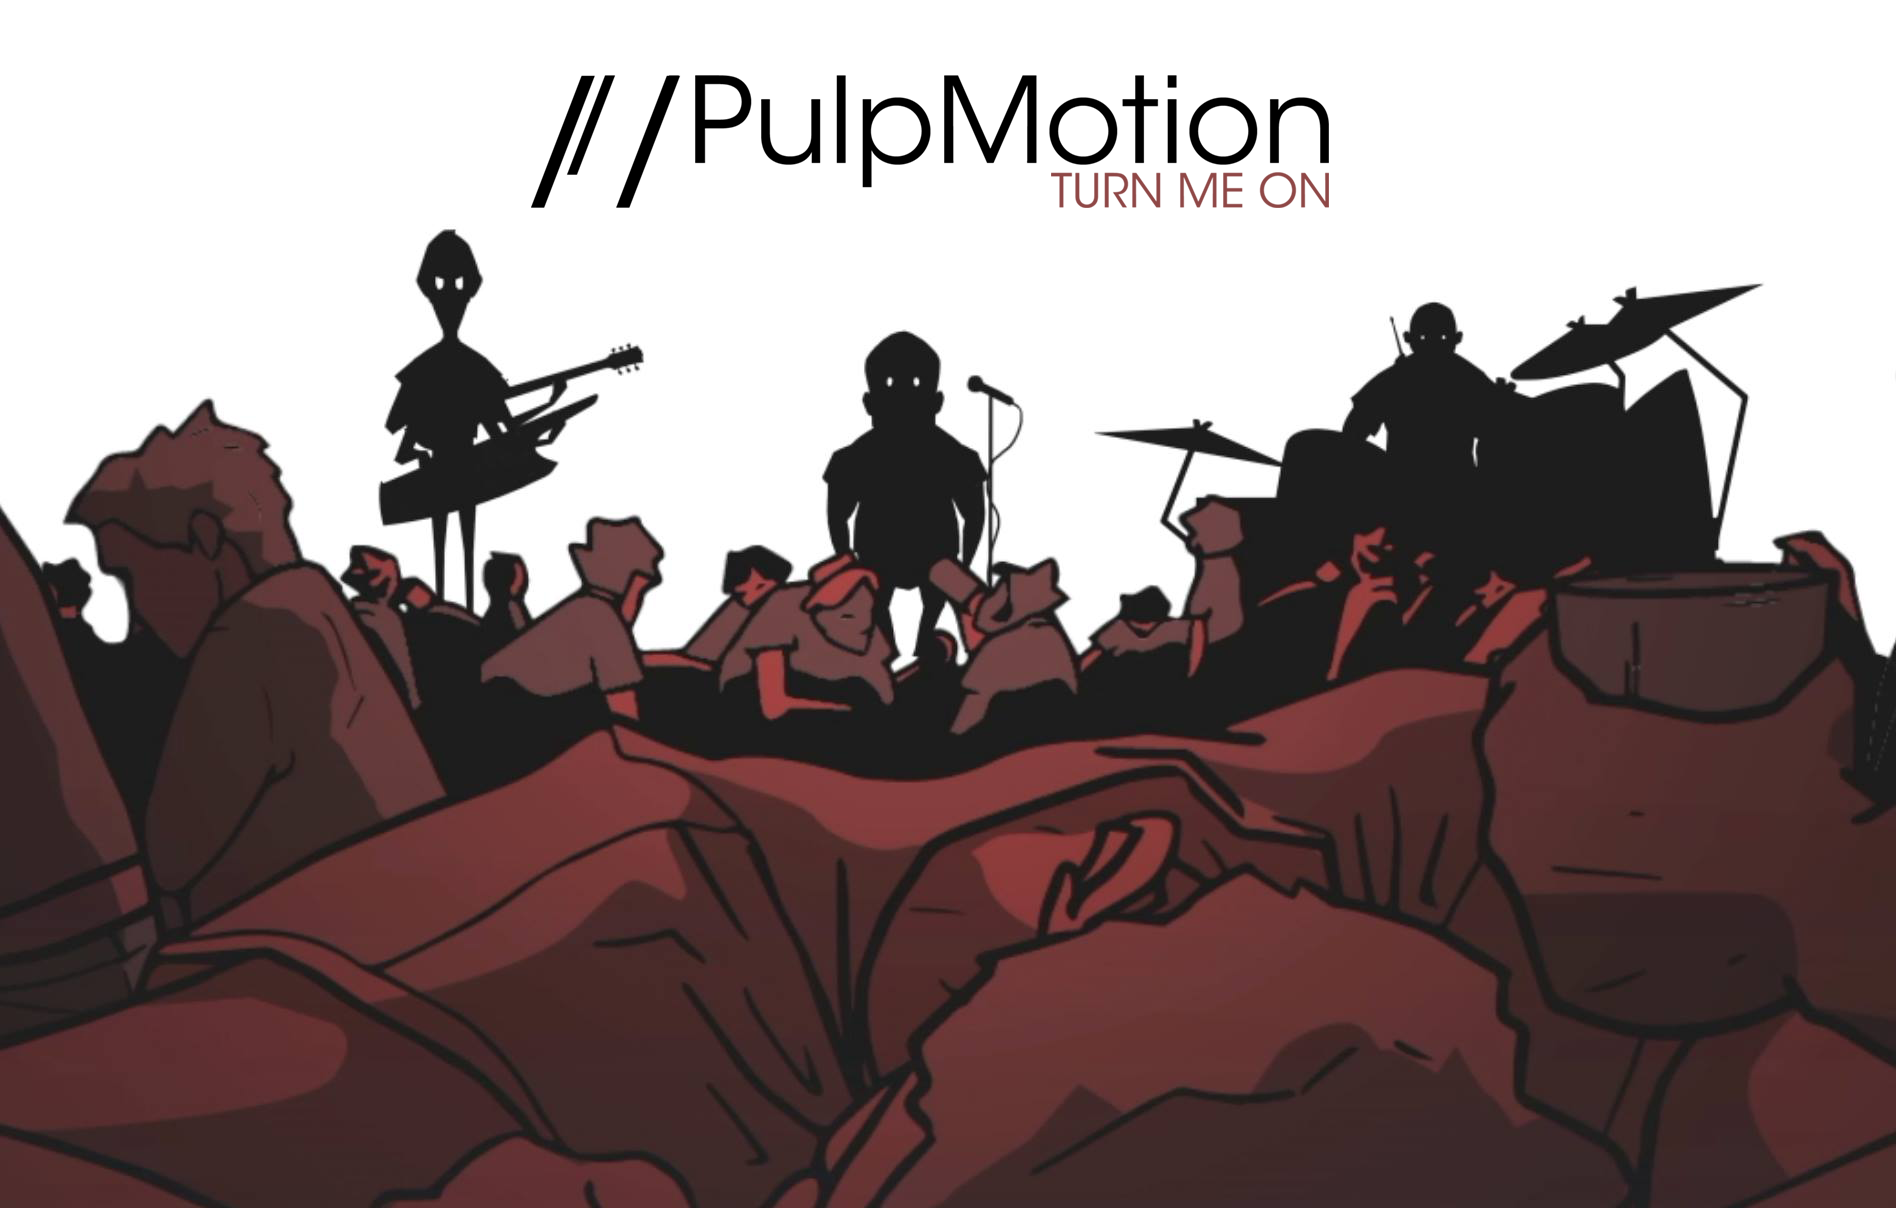 Pulp Motion